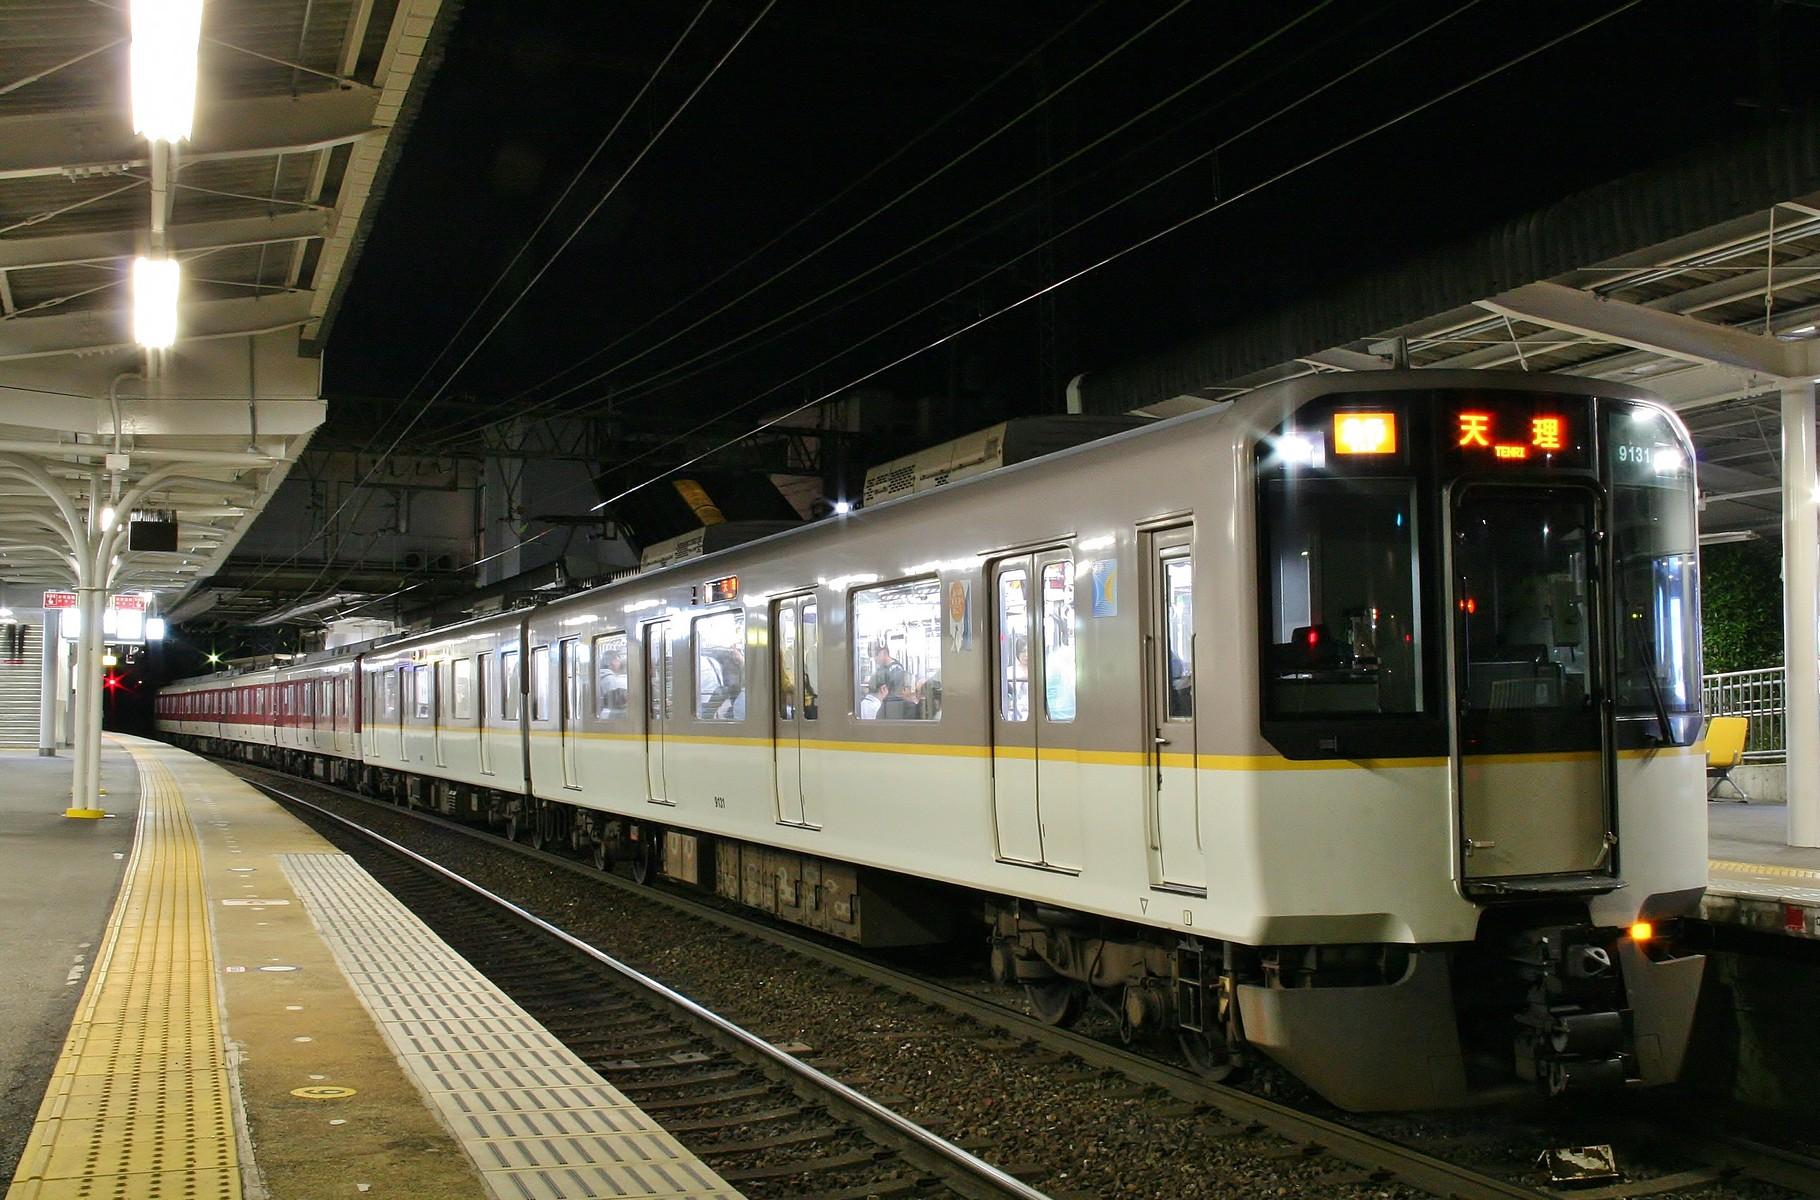 95a946052c9 ダメダメ課長日記。 : 近鉄京都線撮影地